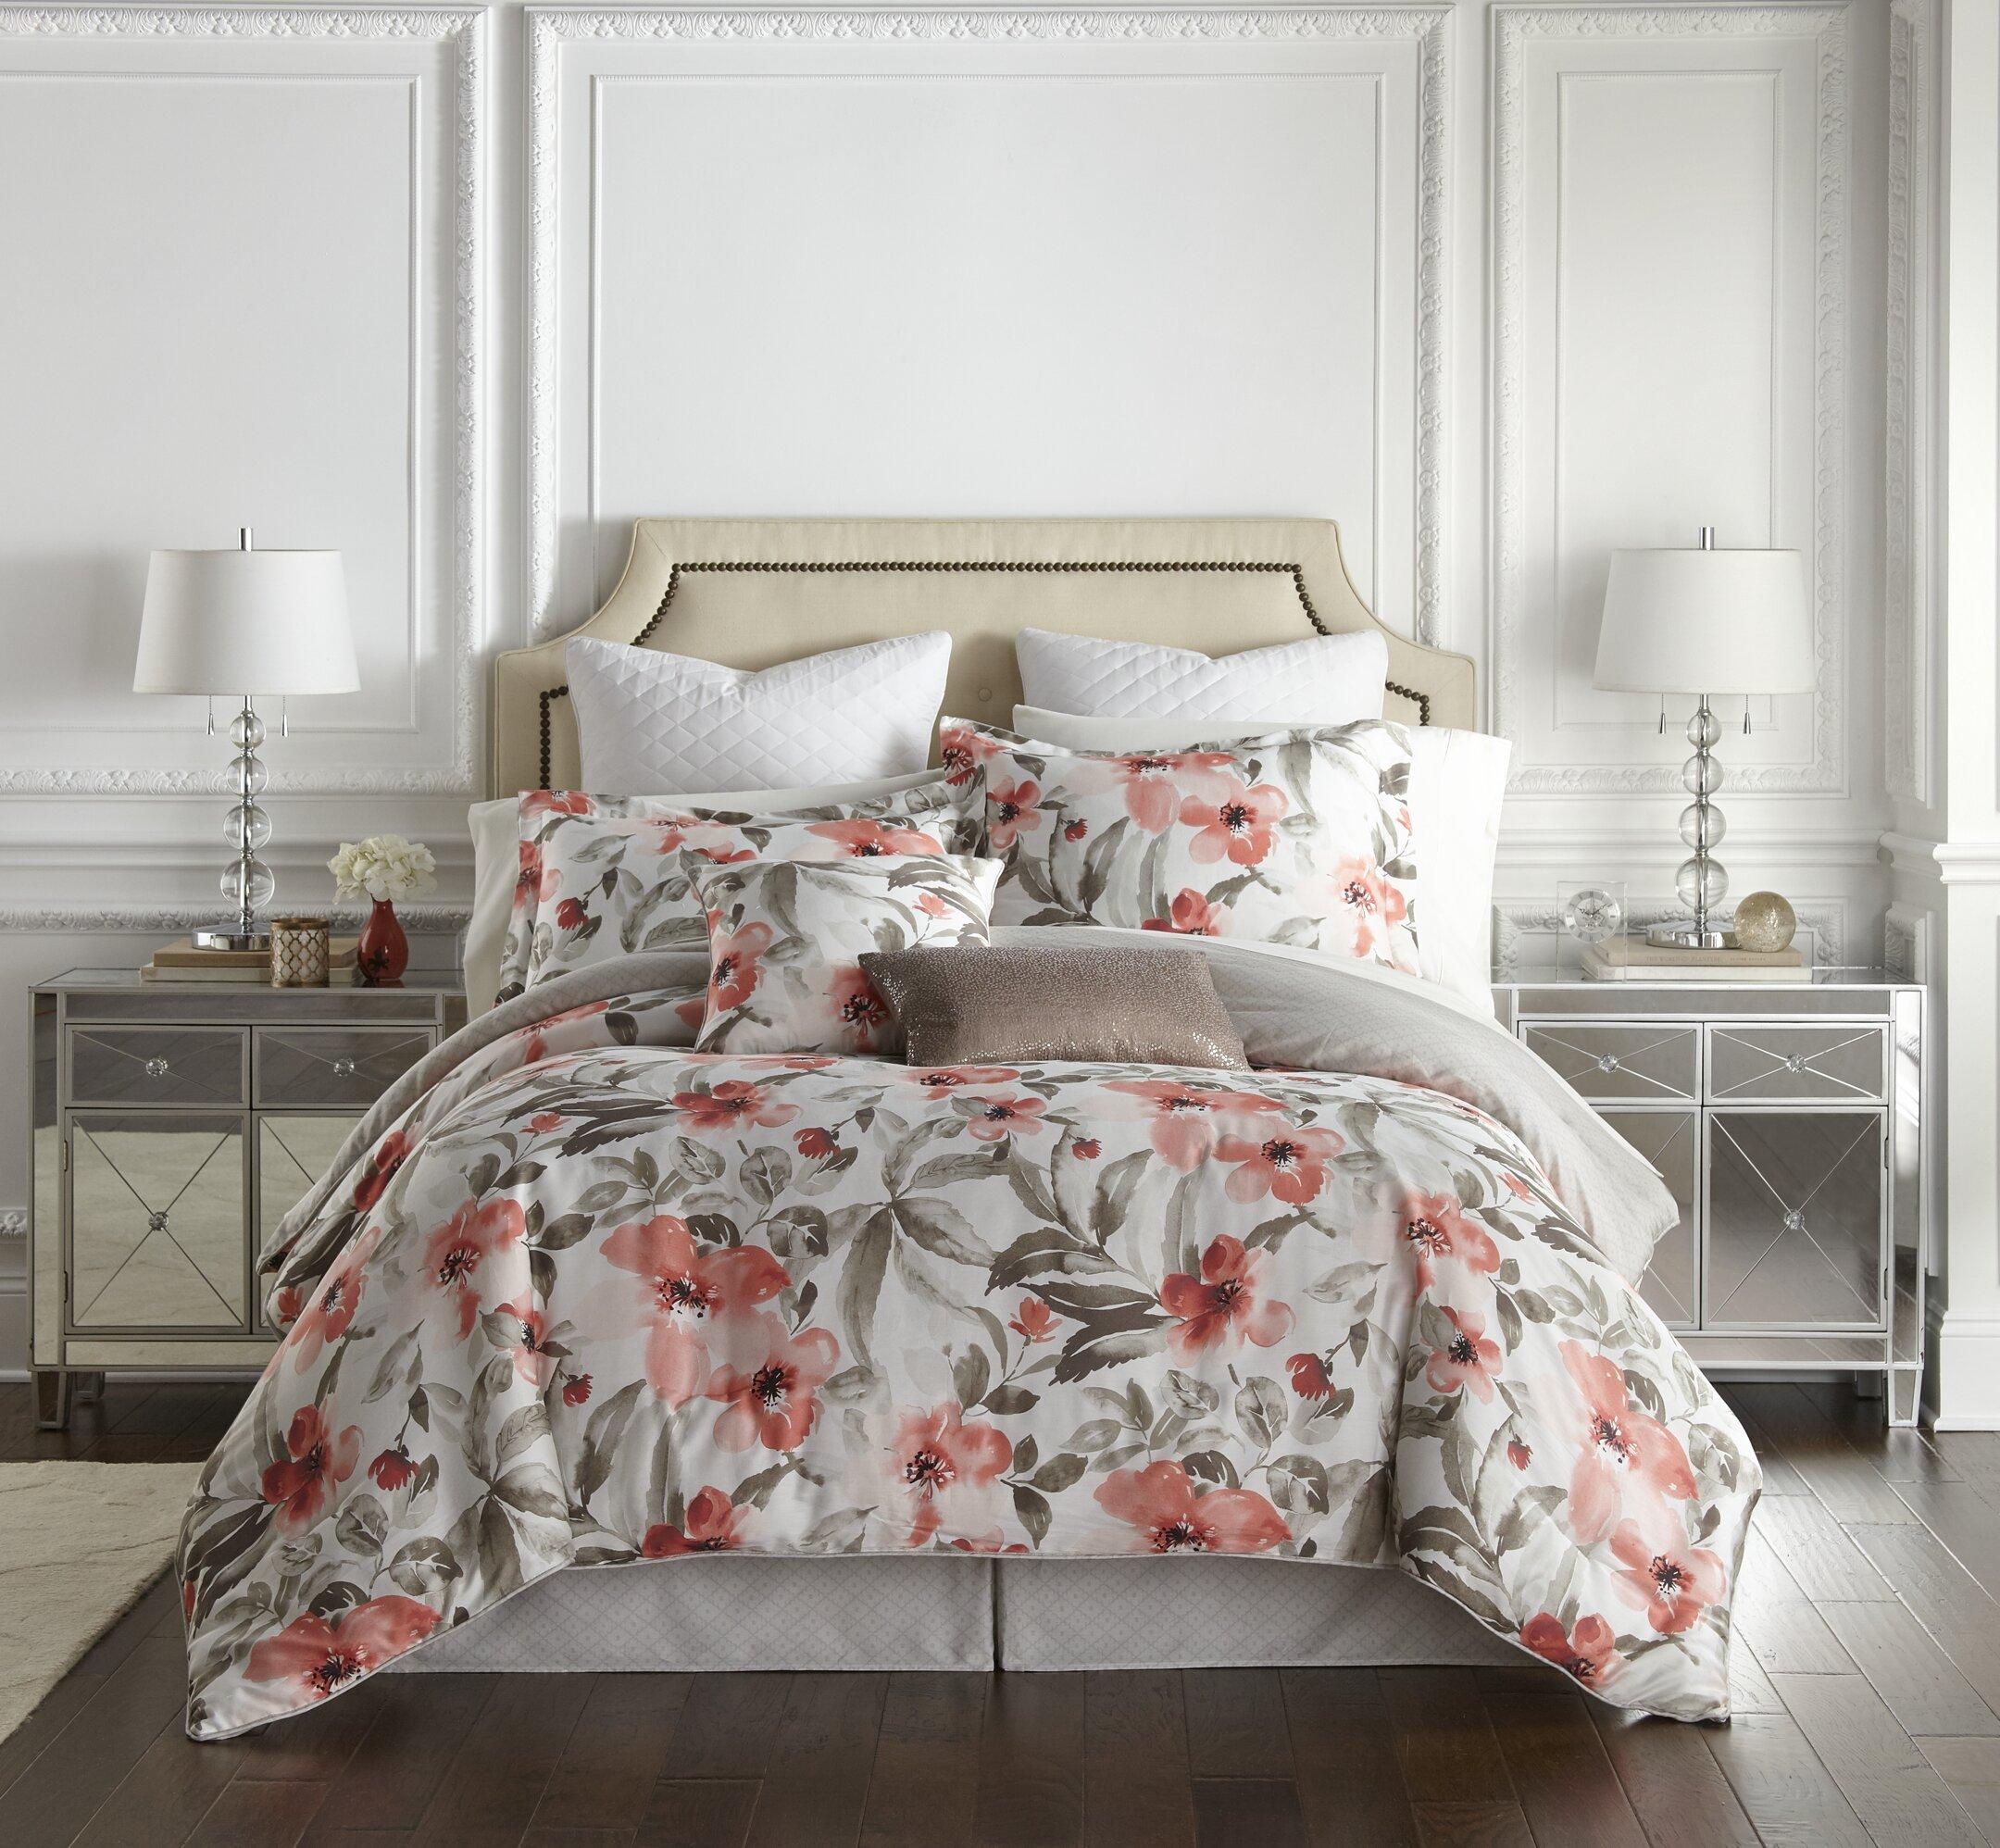 Kathy Ireland Home Orange Pima Cotton 300 Tc 8 Piece Comforter Set Wayfair